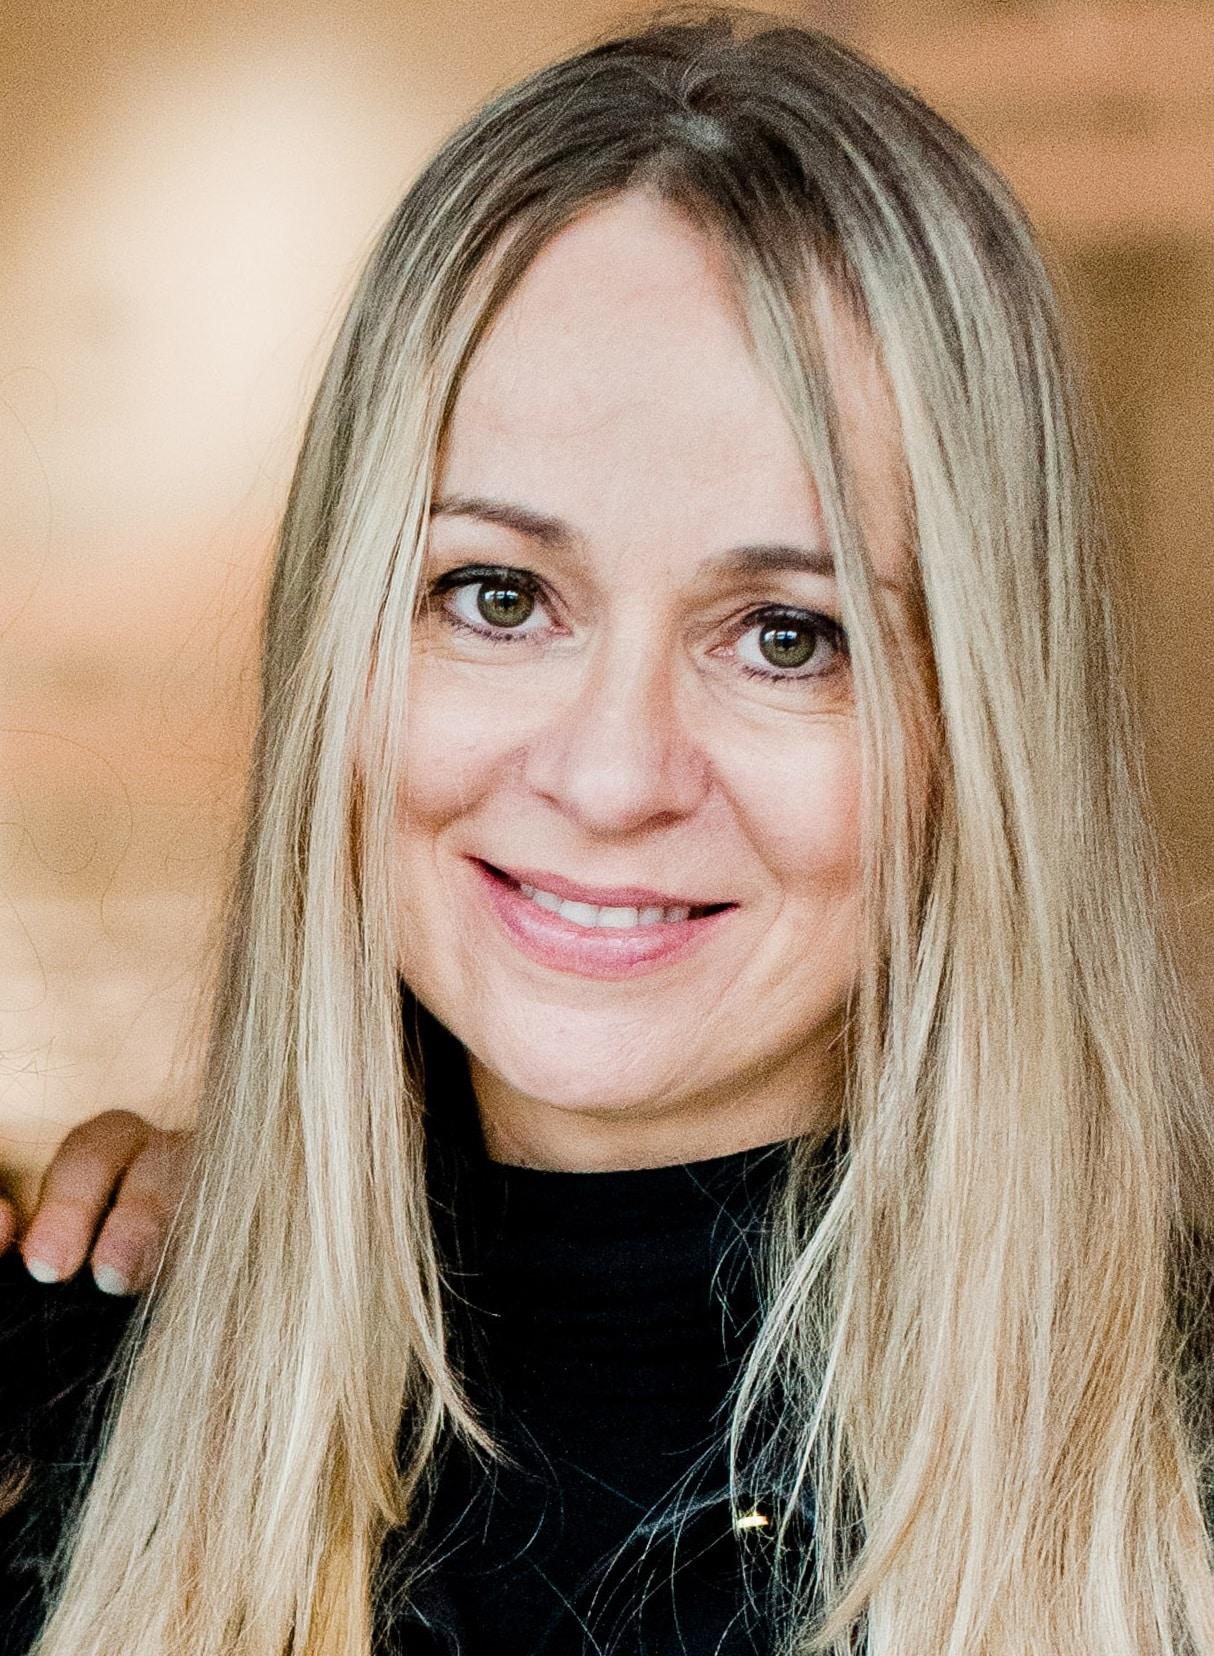 Beata Rakowska aktorka teatralna i dubbingowa opowiada o pracy z seniorami